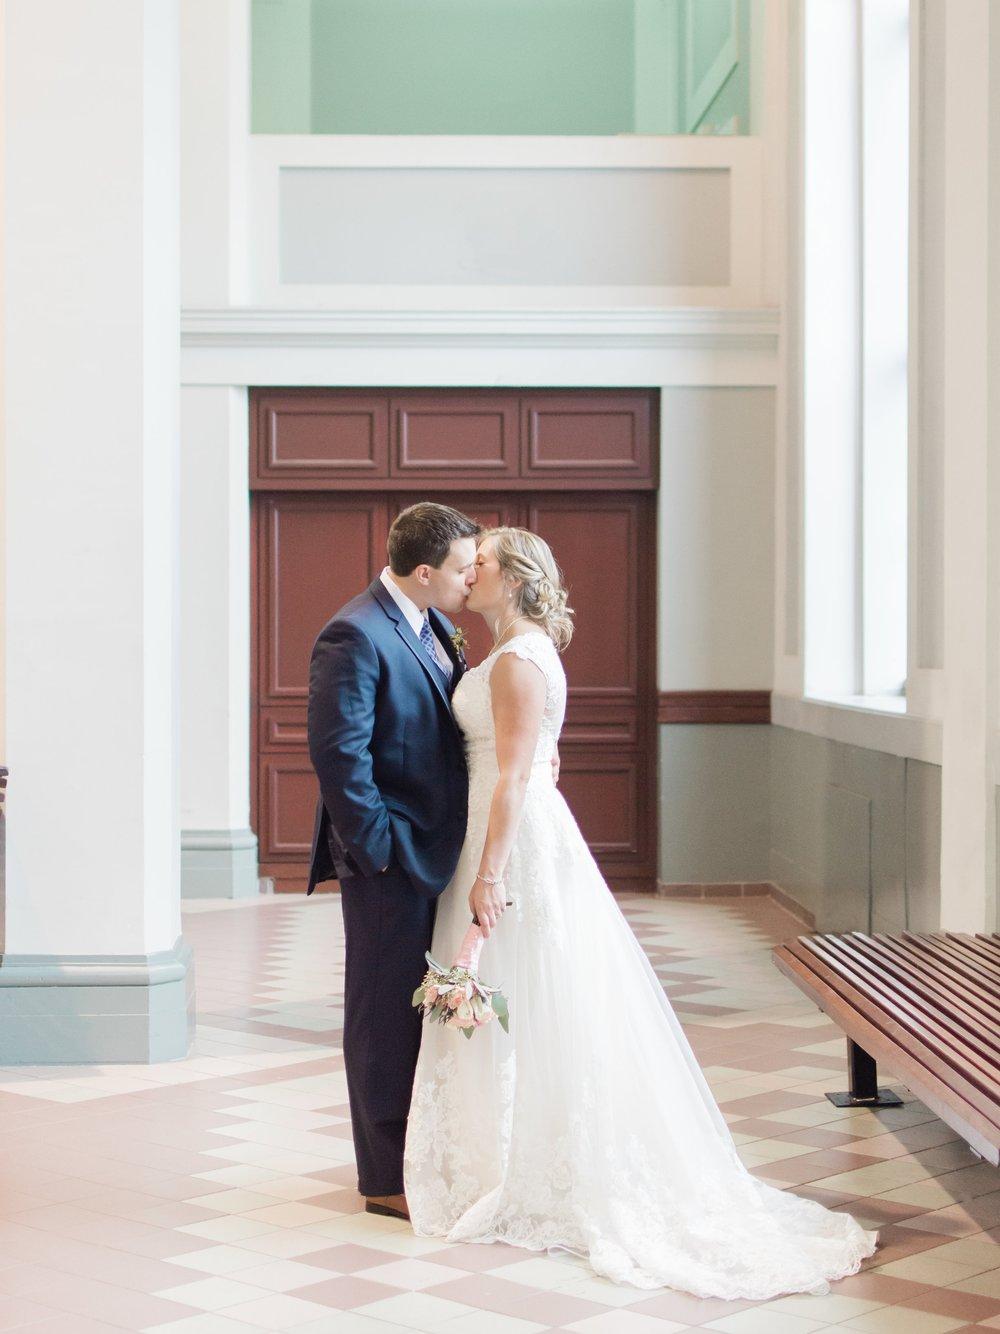 Jacqueline Anne Photography  - M&B Wedding - 081818-273.jpg